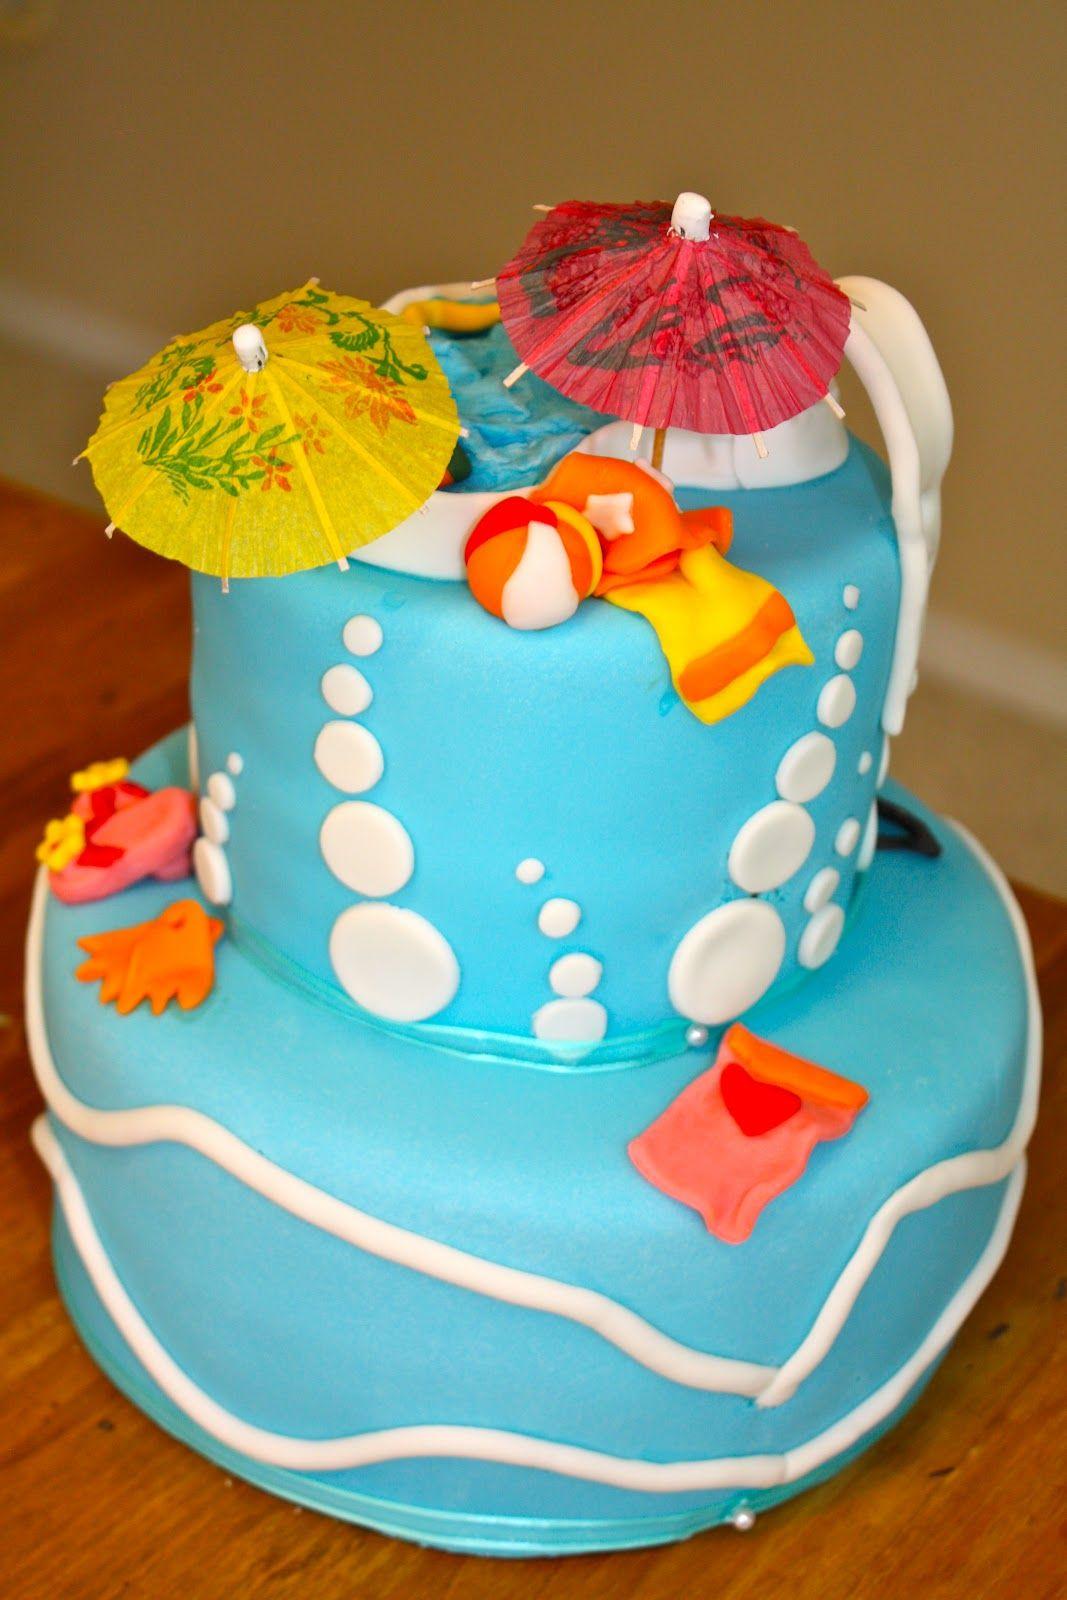 Pool Party Birthday Cake Ideas Party Birthdays Boy Cakes